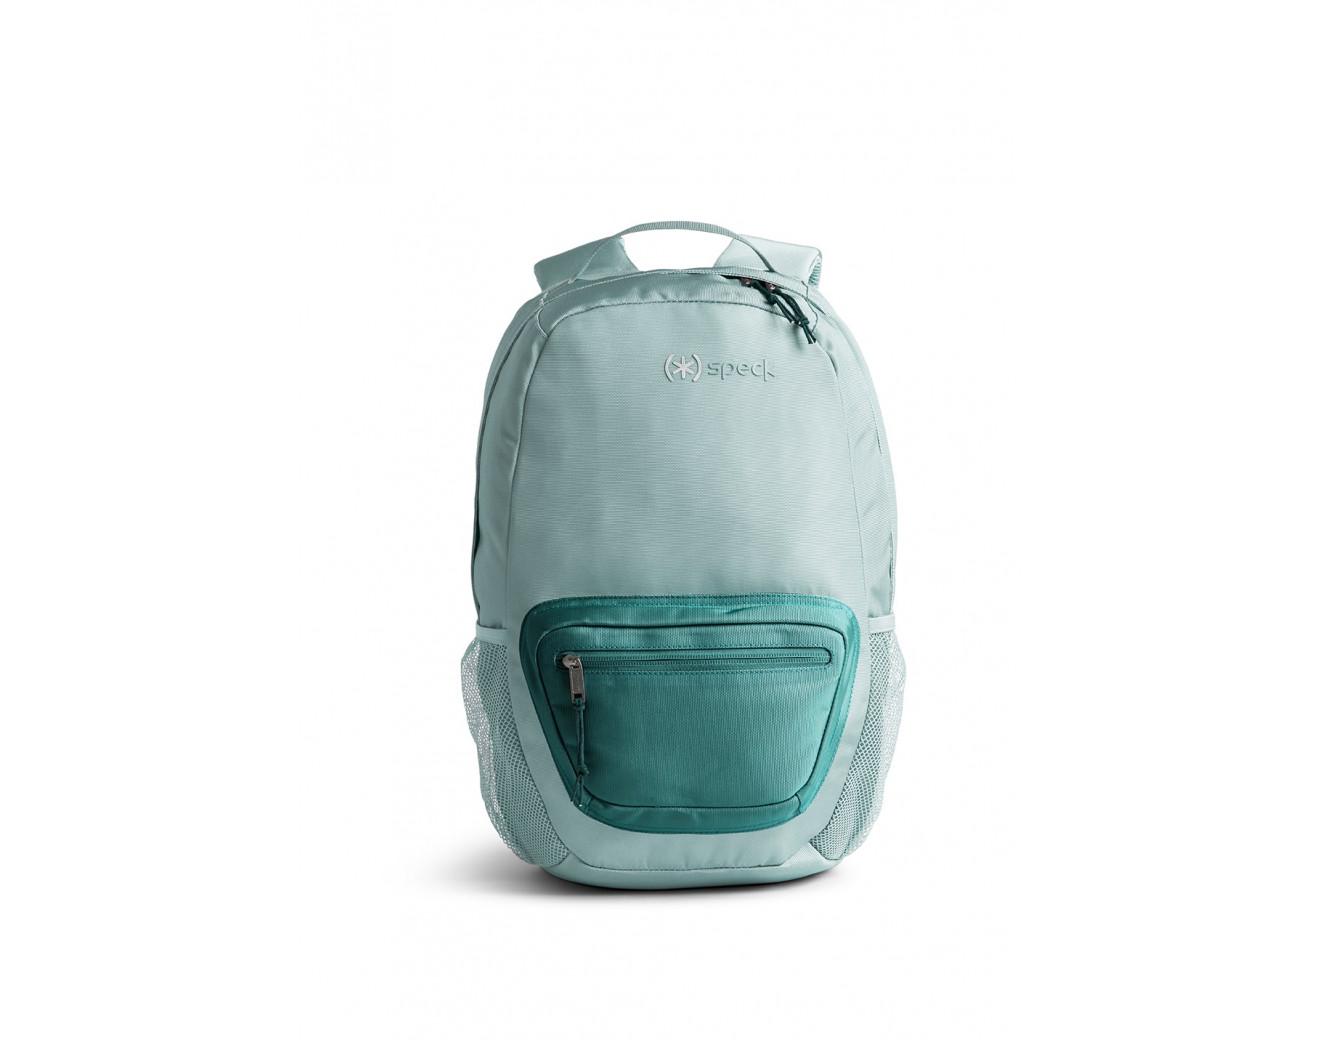 Раница Speck Deadline Backpack 24L Backpack - Pistachio Green